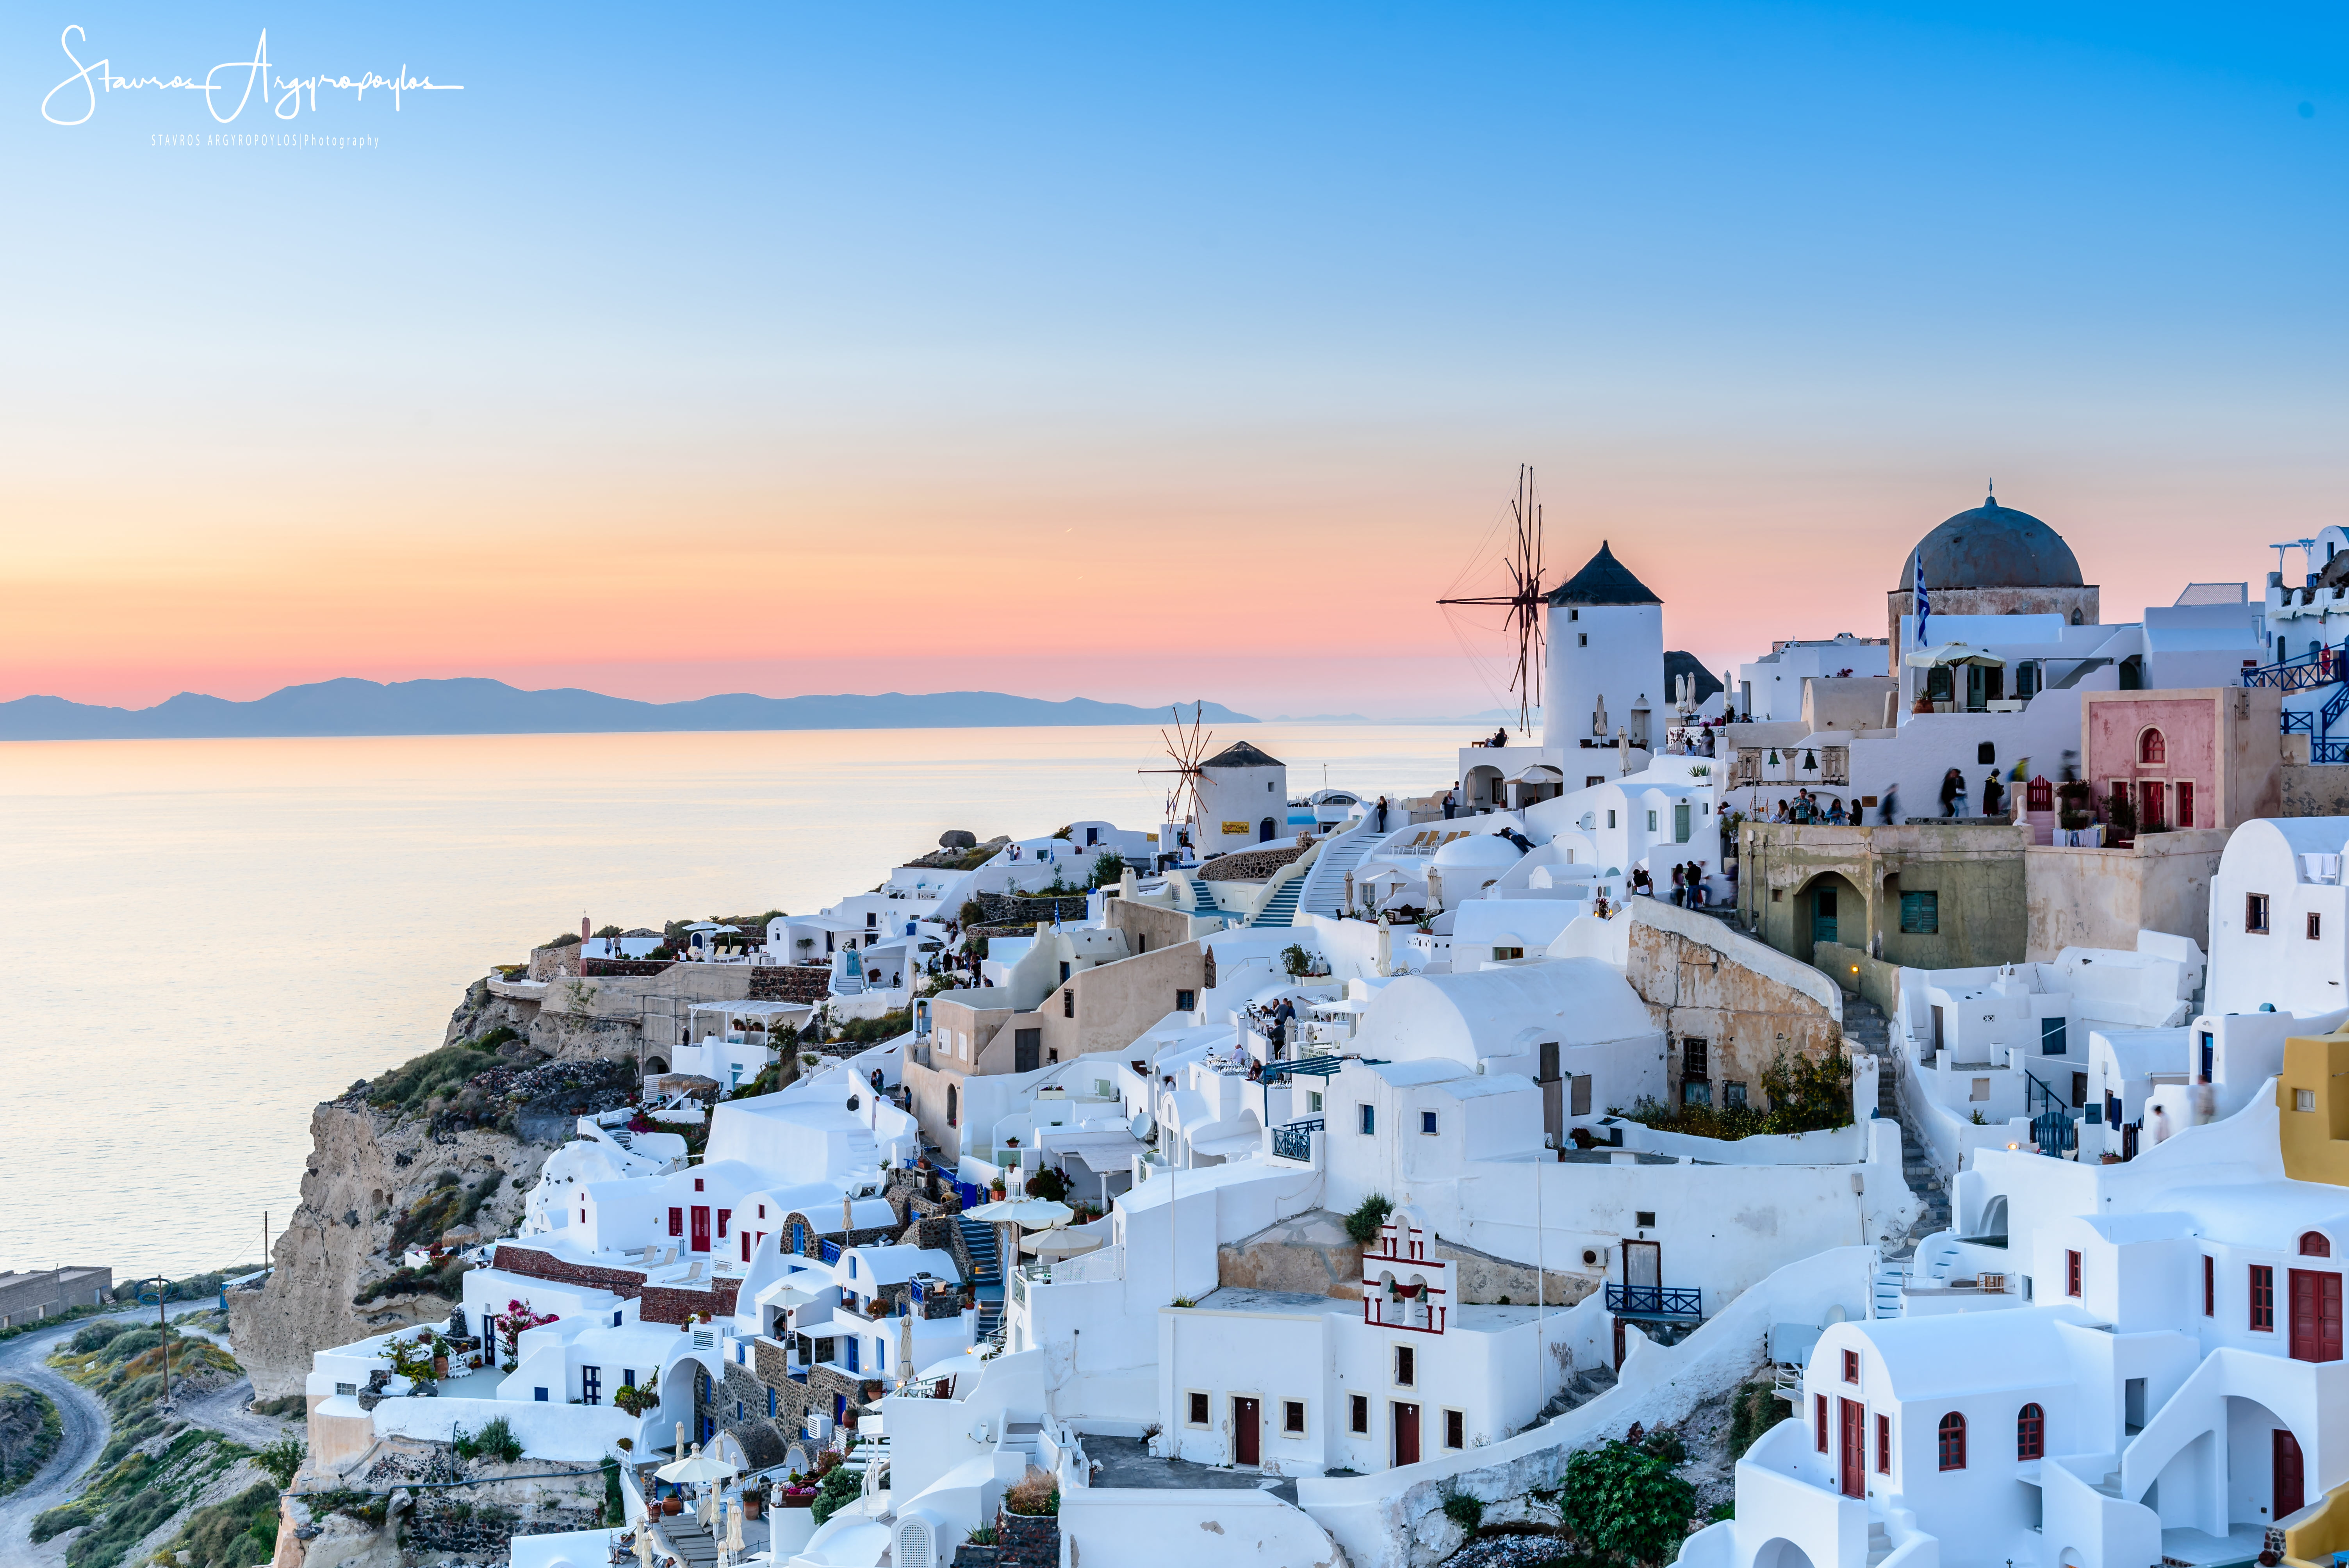 Photo of Santorini Greece during golden hour oia HD wallpaper 6016x4016